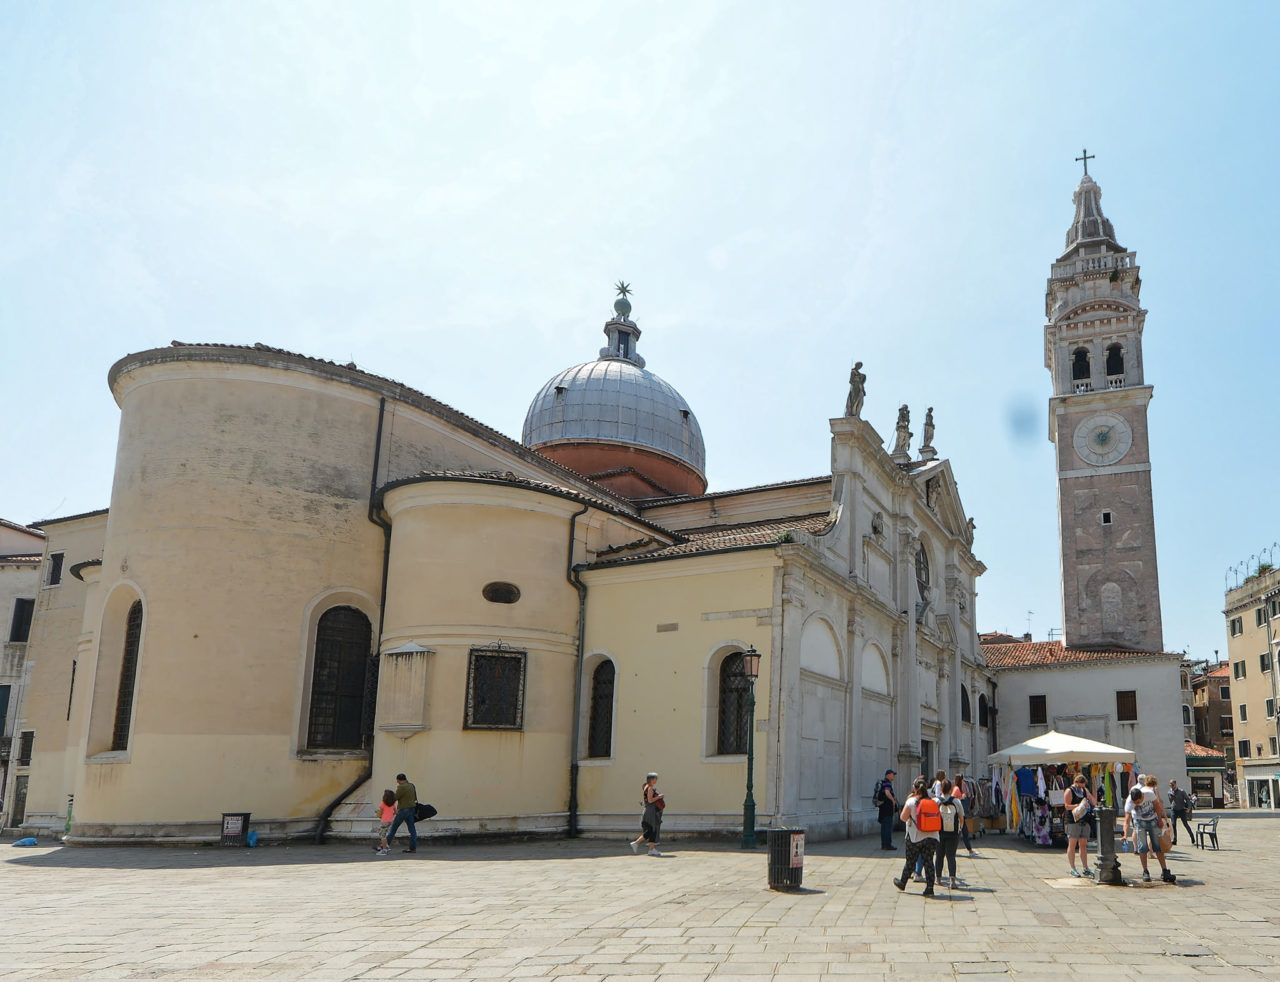 Церковь Санта-Мария Формоза (Santa Maria Formosa)